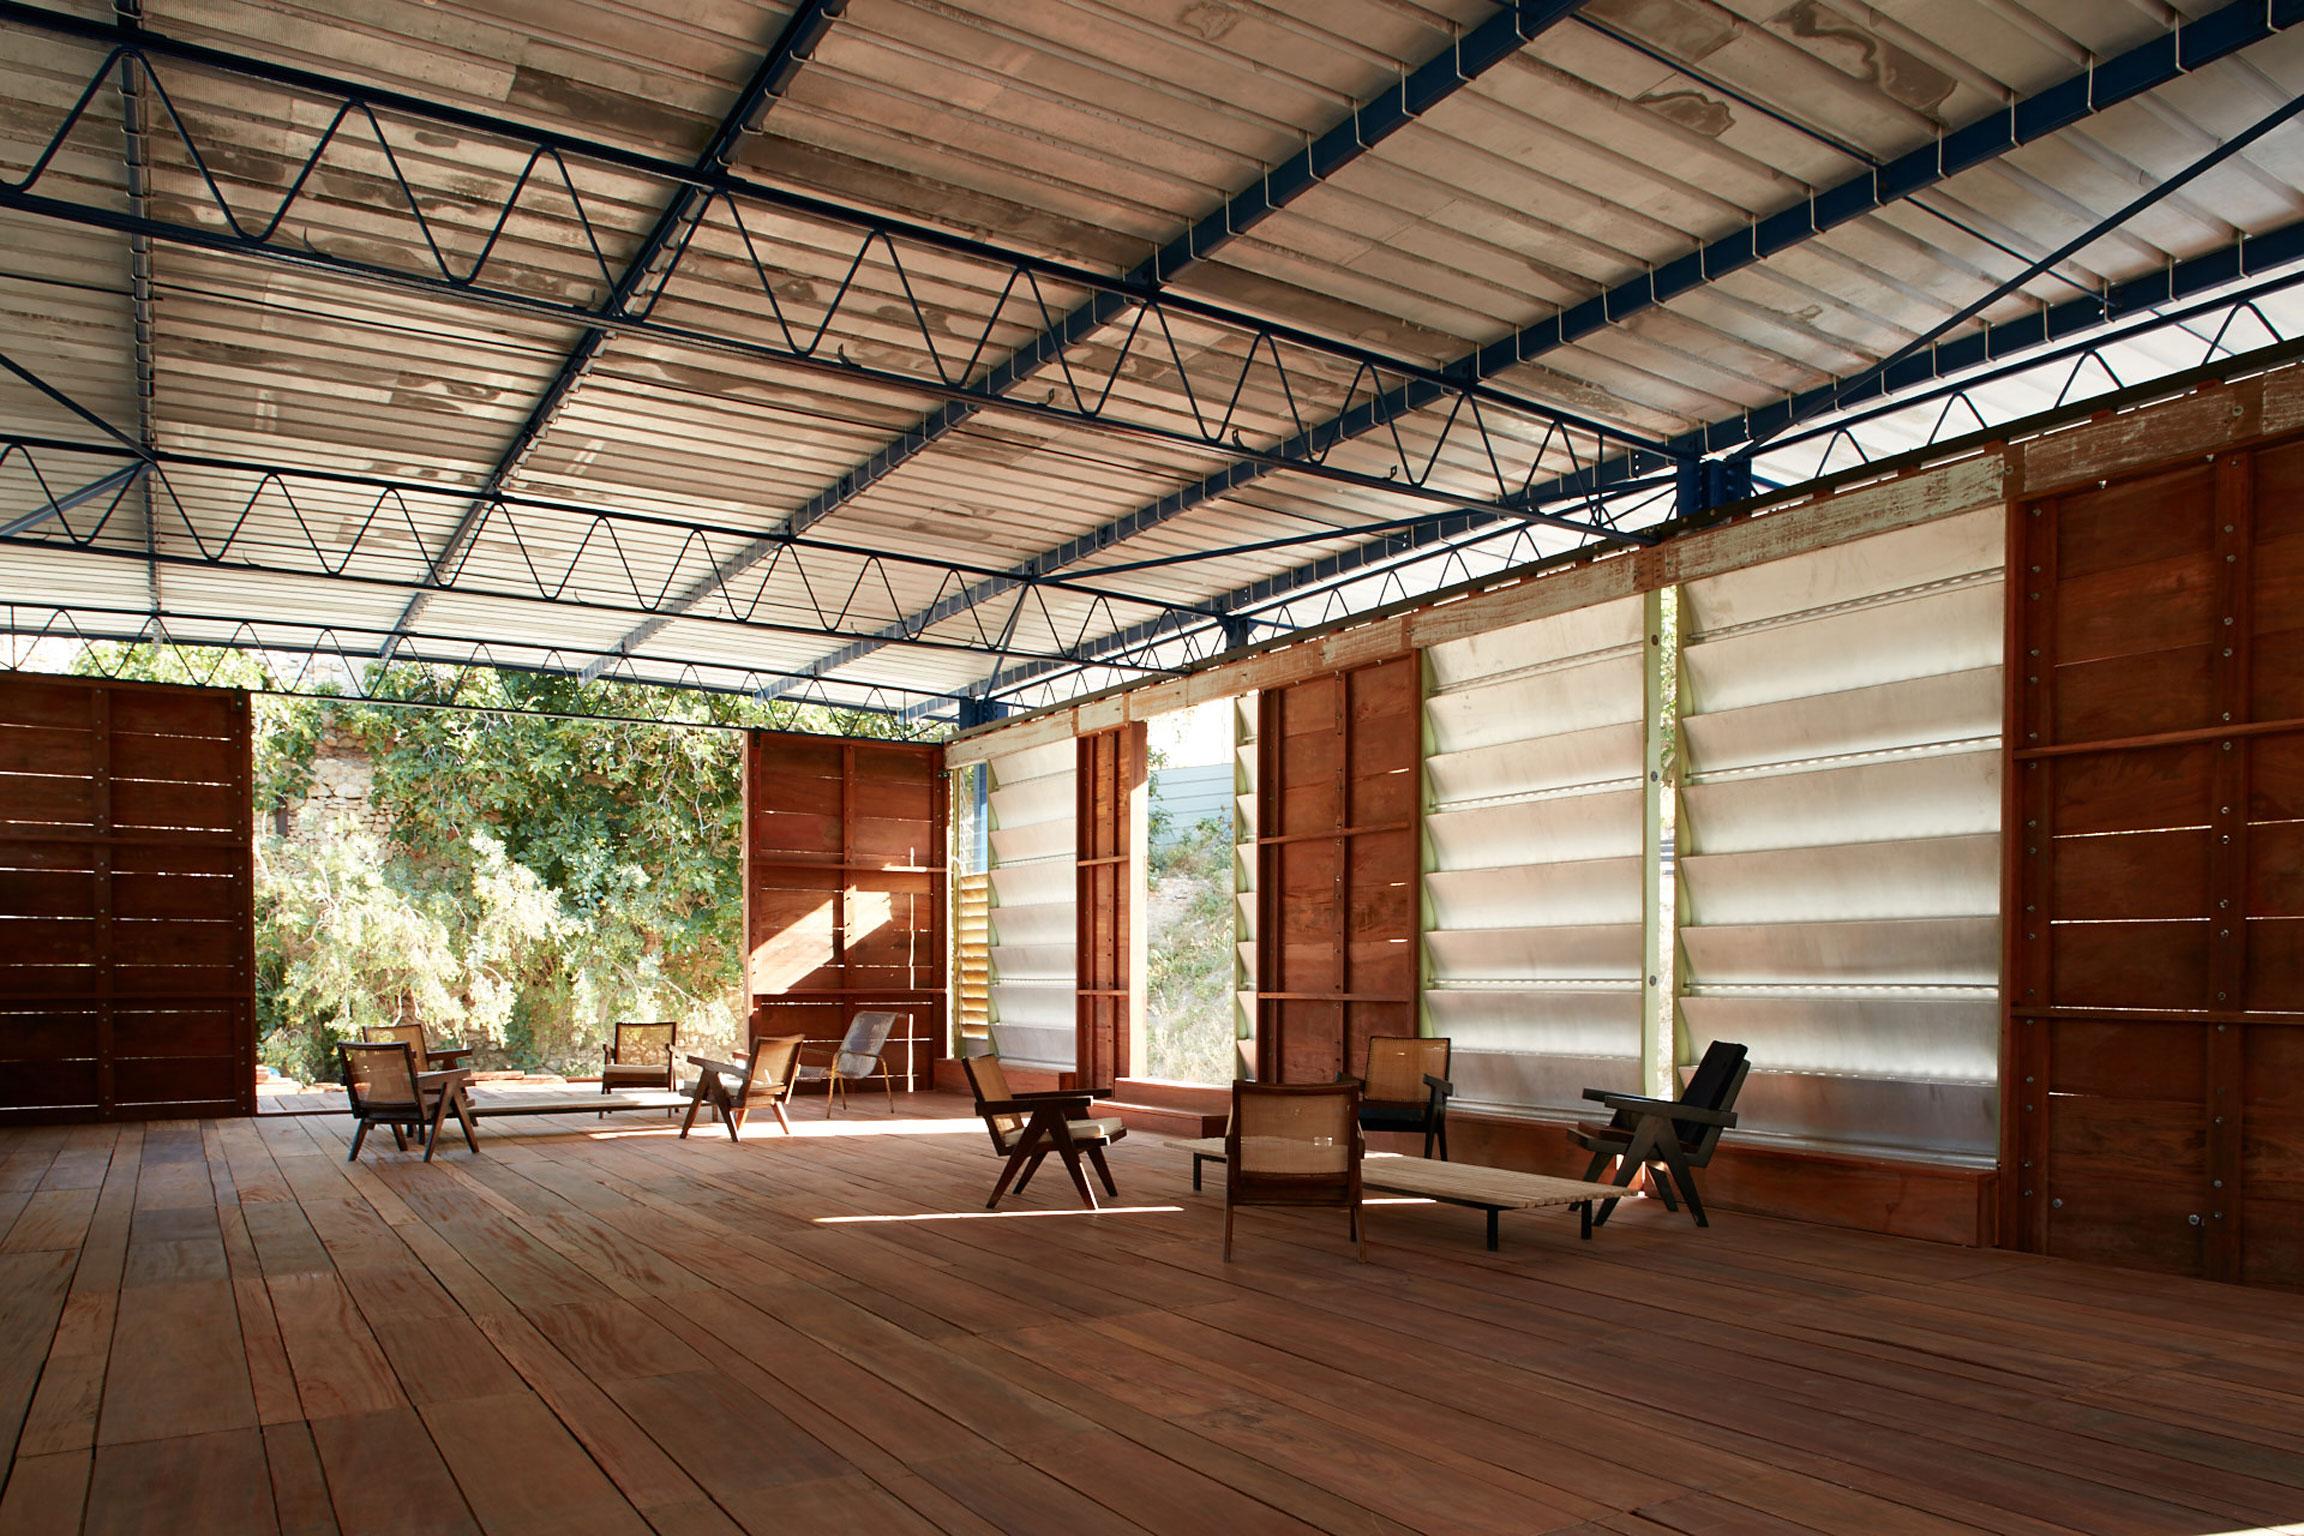 Jean Prouve & Atelier LWD Prototype Habitat Tropical